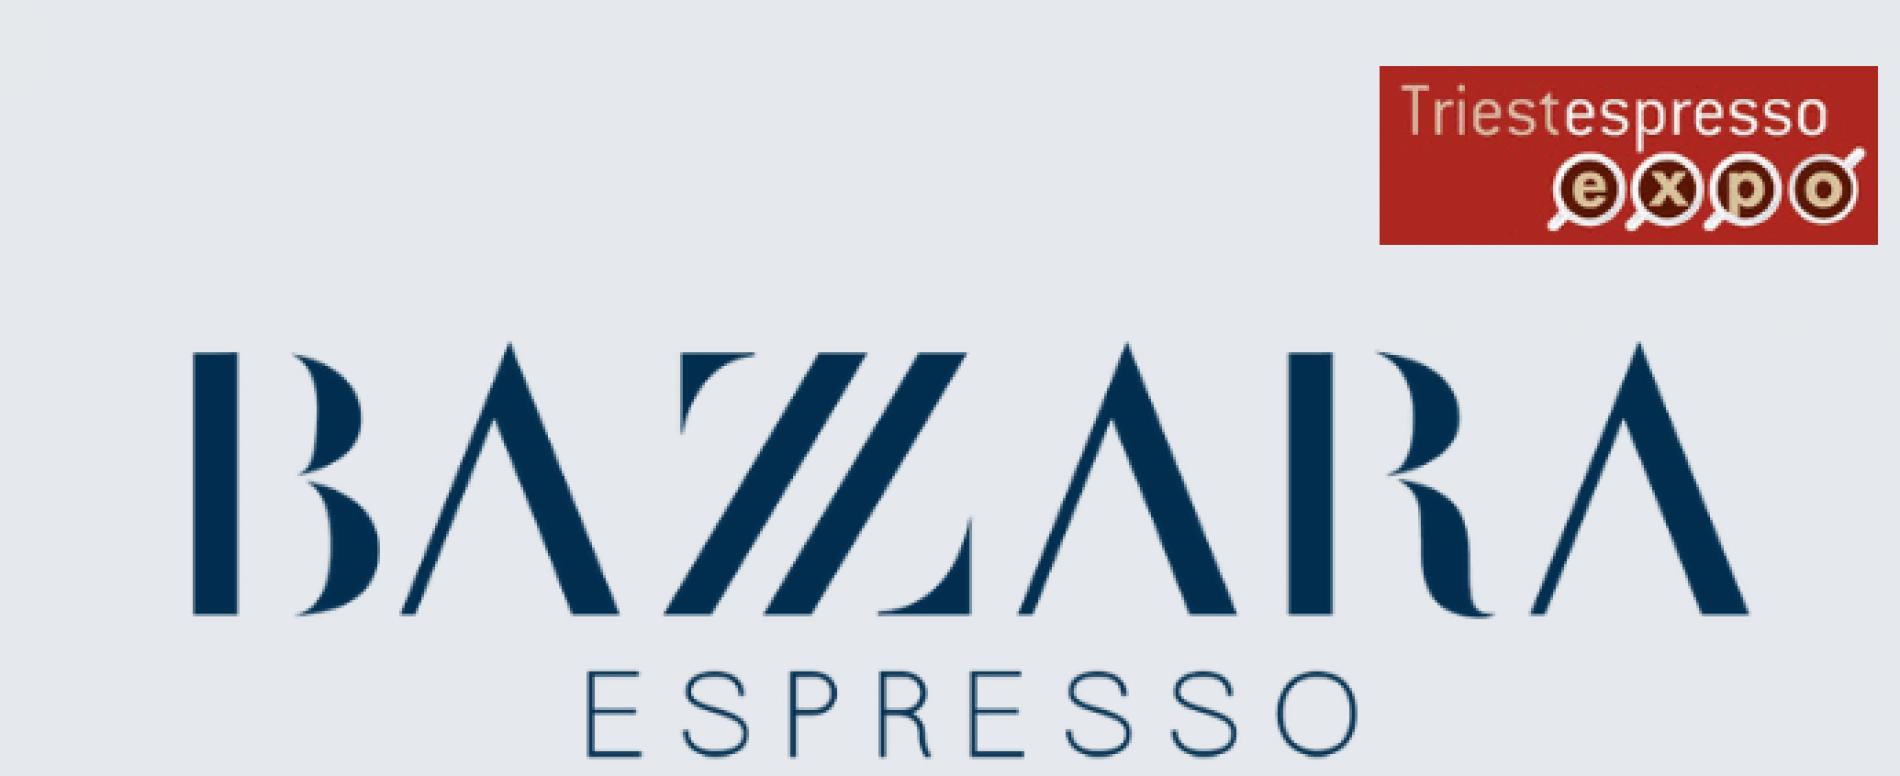 Bazzara srl a TriestEspresso 2018. Pad. 27 – Stand 12-49